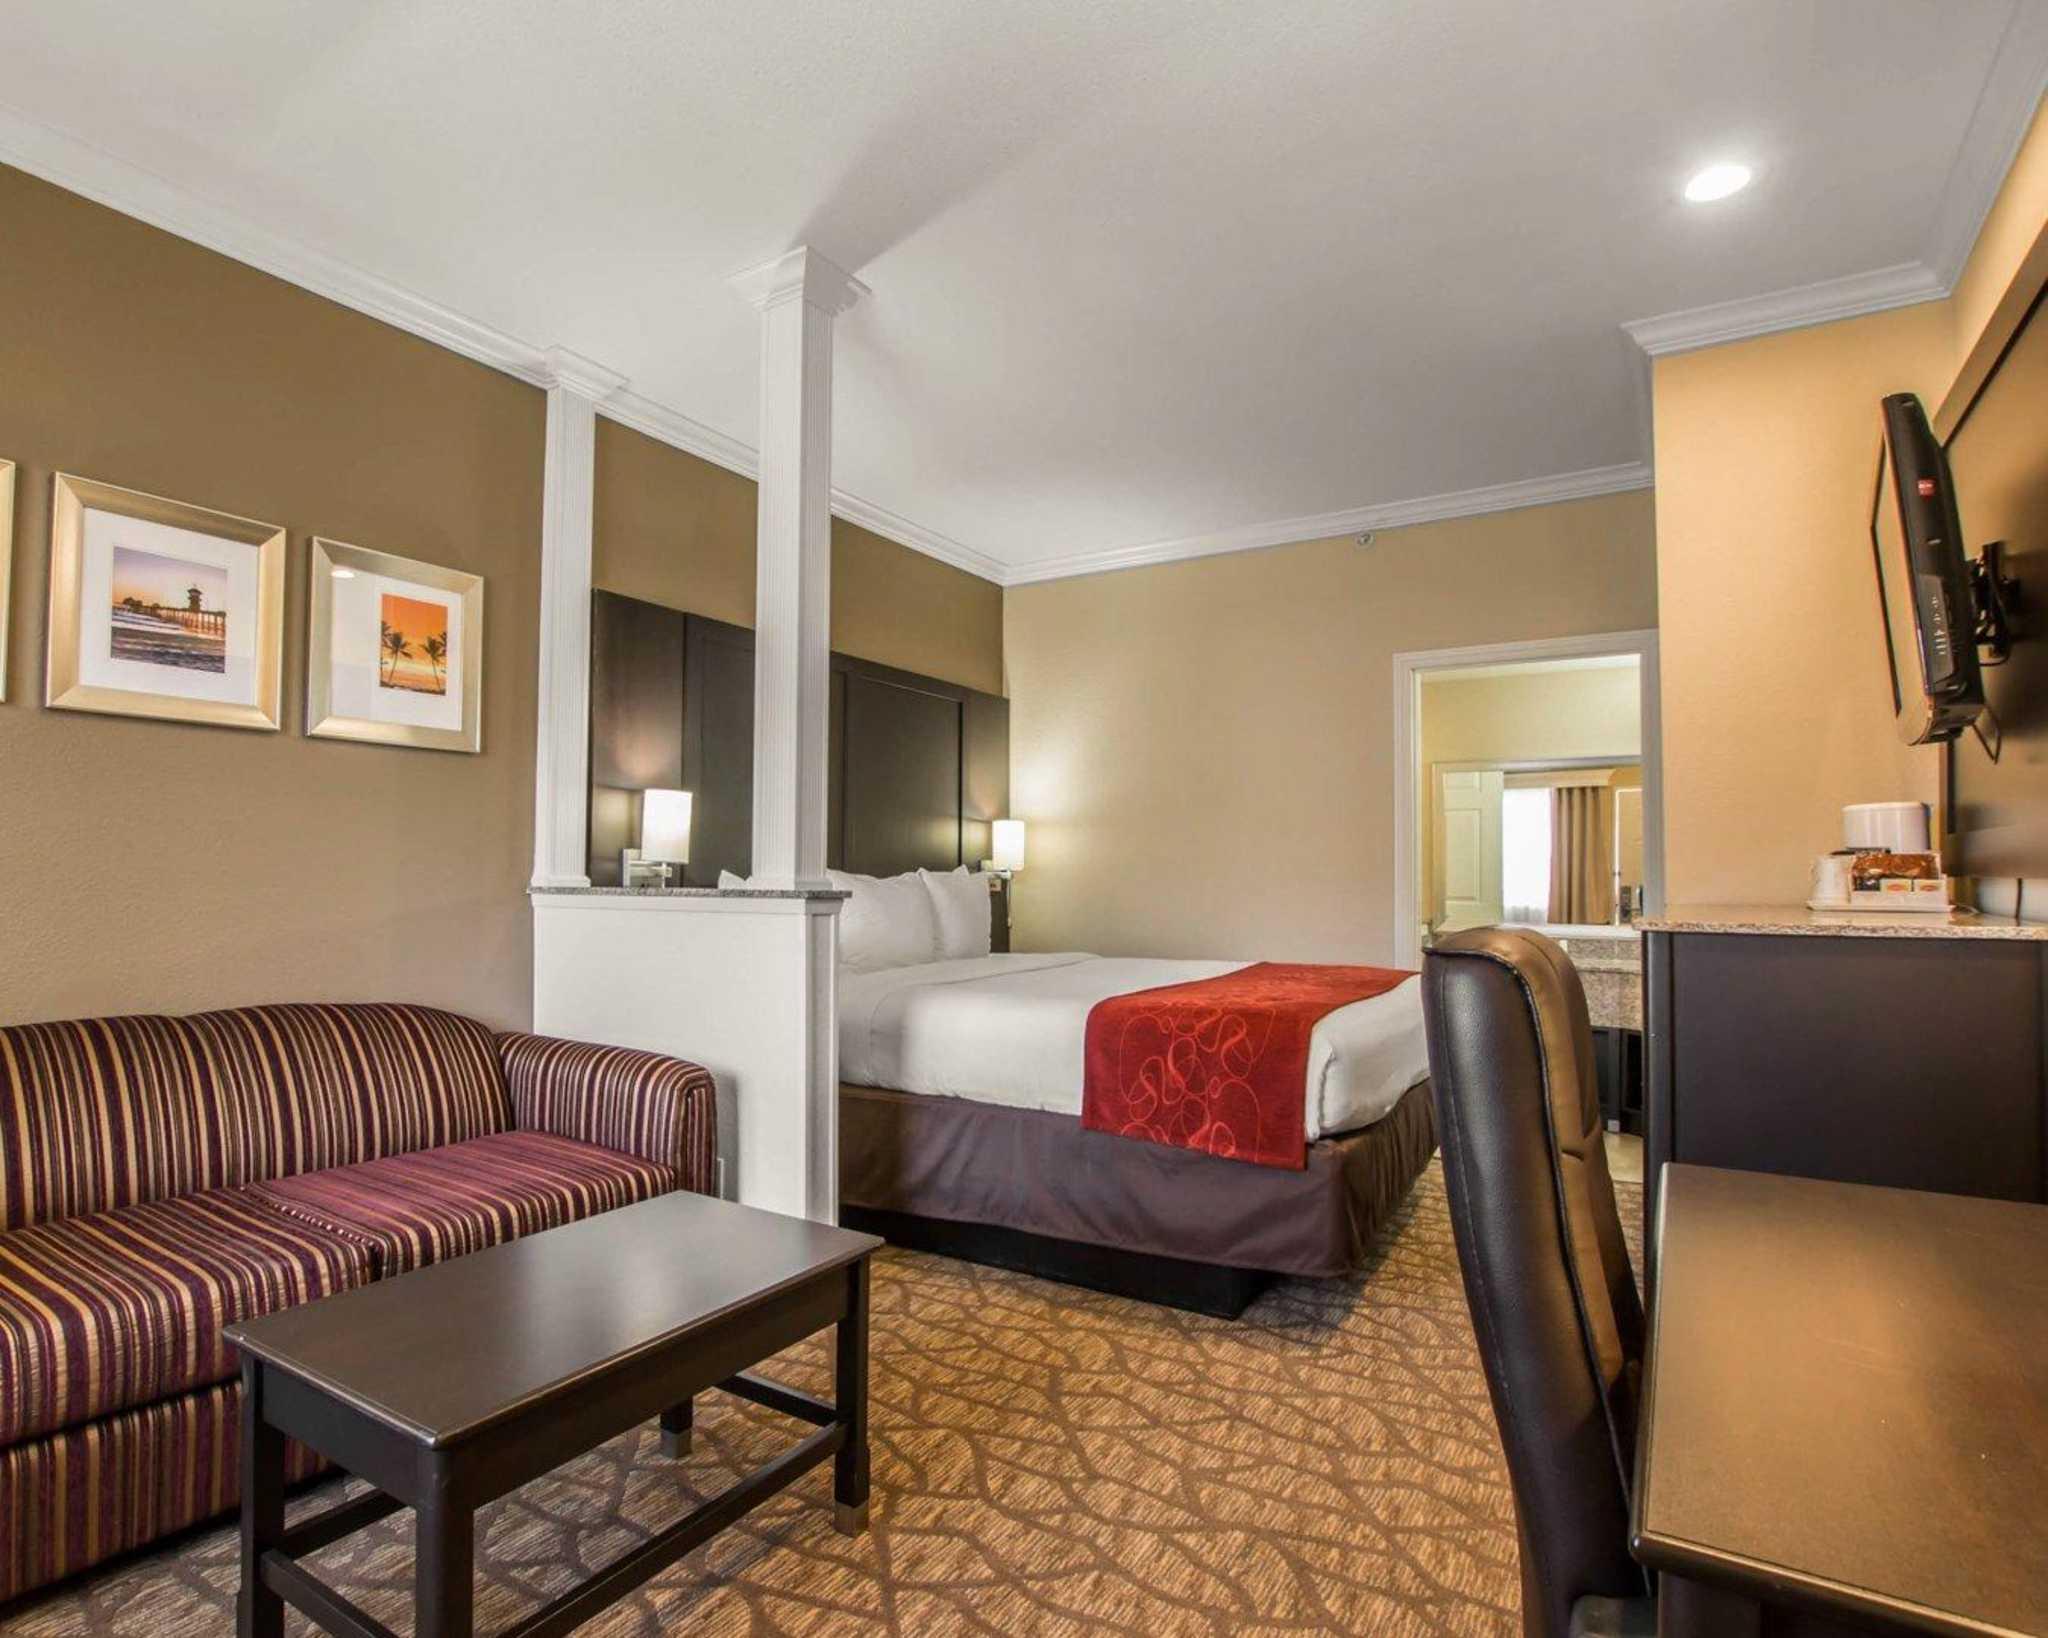 Comfort Suites Huntington Beach image 5